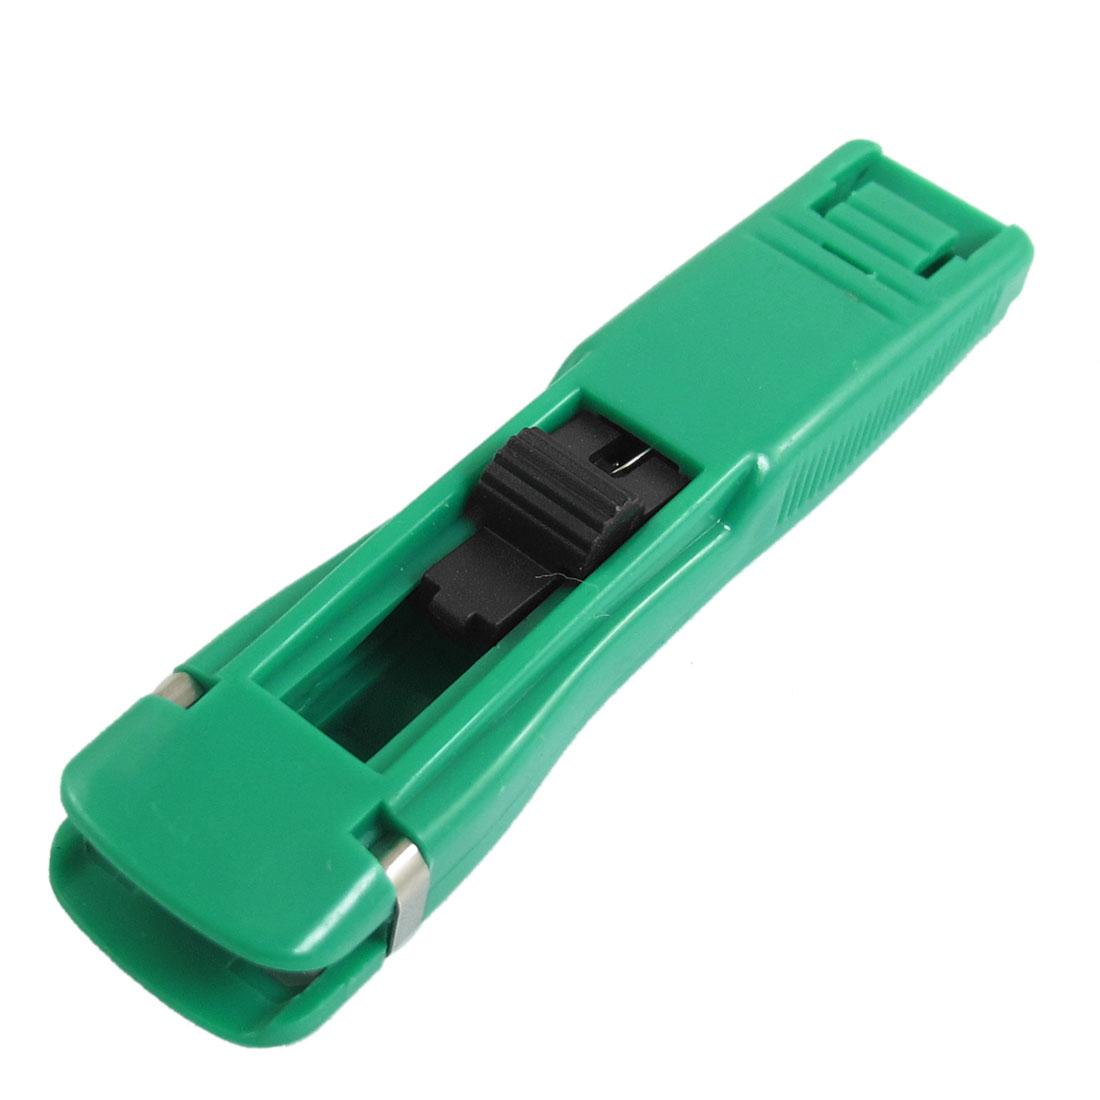 Green Plastic Housing 20 Pcs Sheet Metal Clamp Dispenser w 40 Pcs Clips